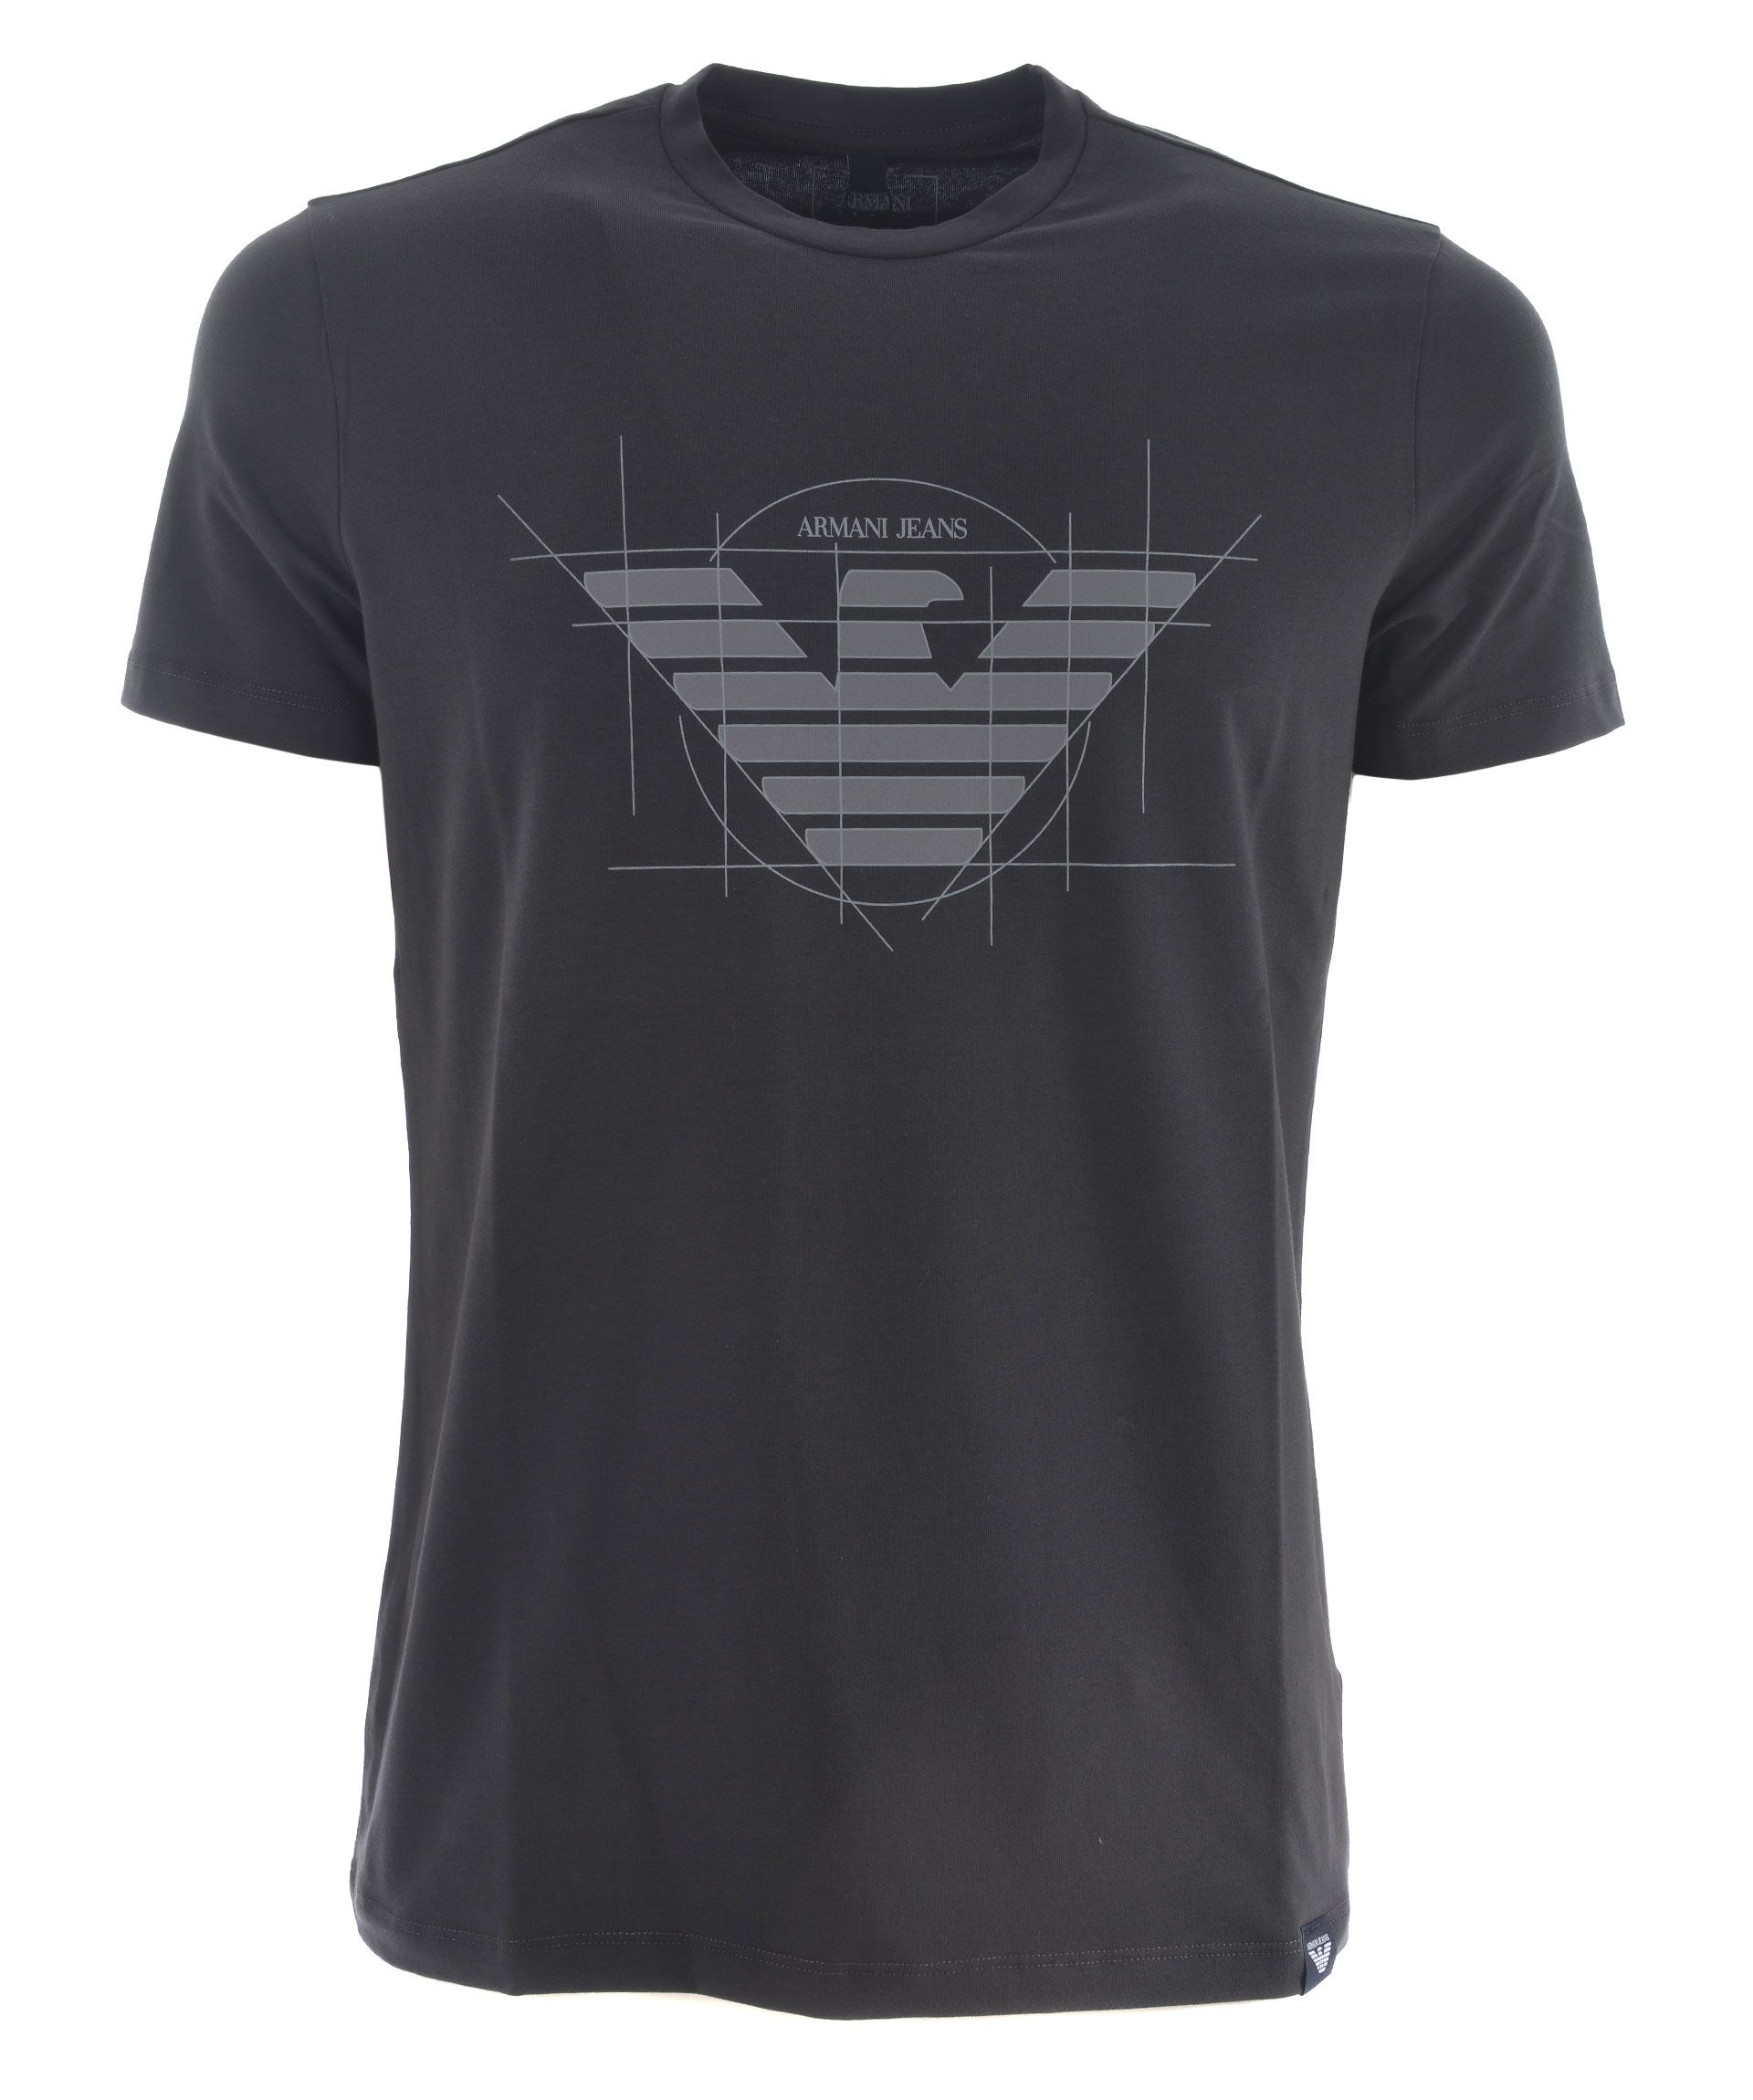 Armani Jeans Logo Print T-shirt